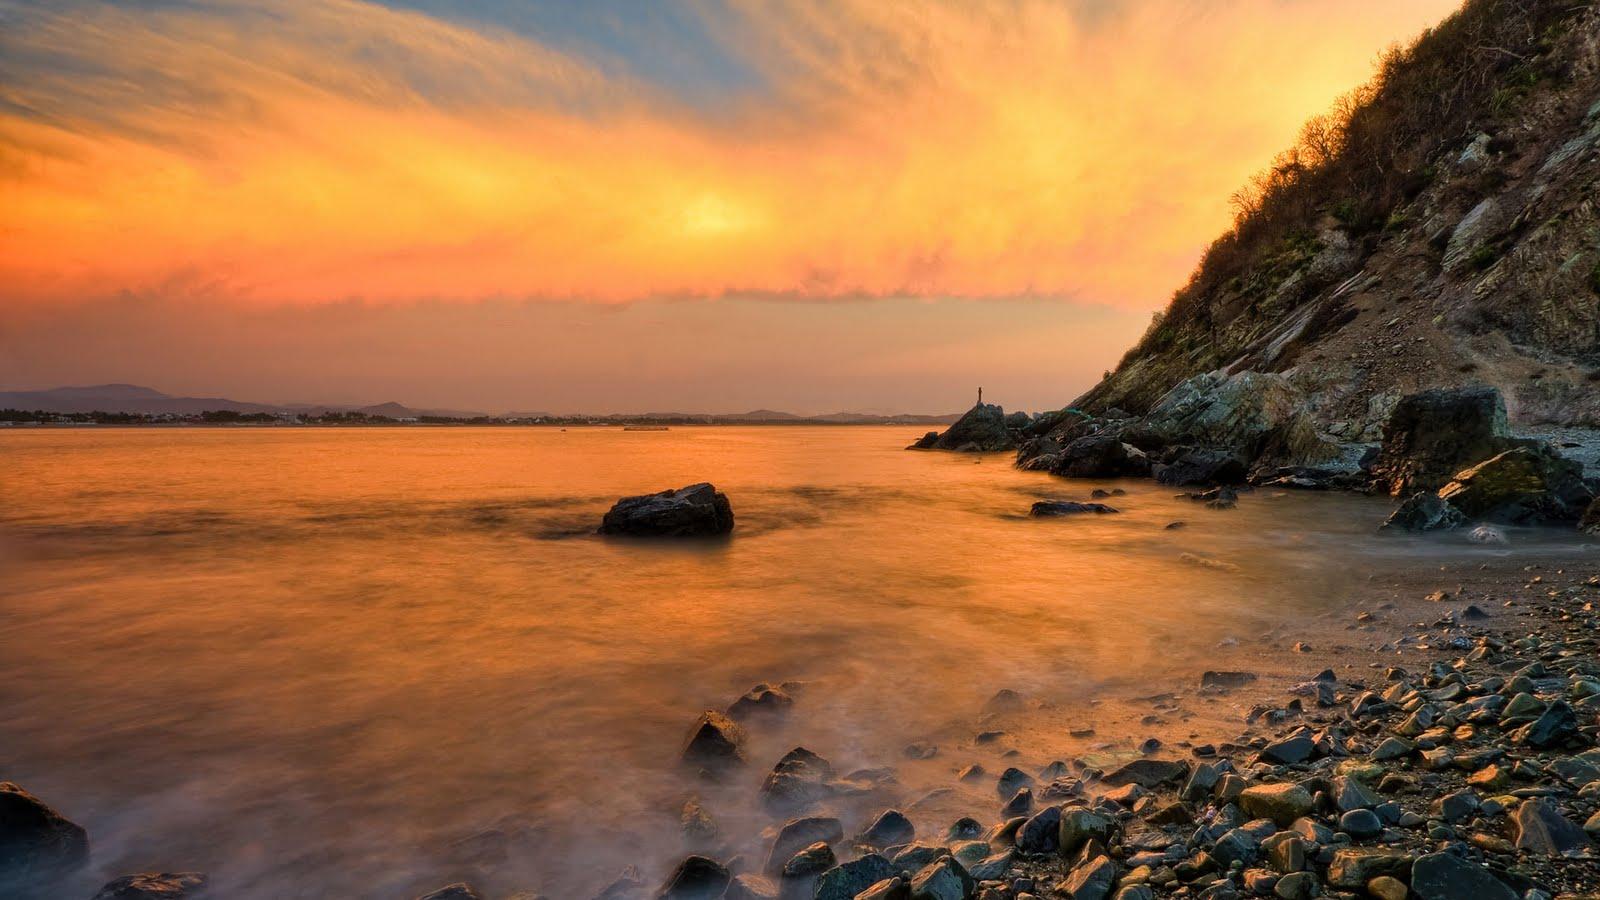 Landscape Hd Wallpapers 1080p: Jaspreet Rekhi: 20 Amazing Landscapes Full HD Wallpapers